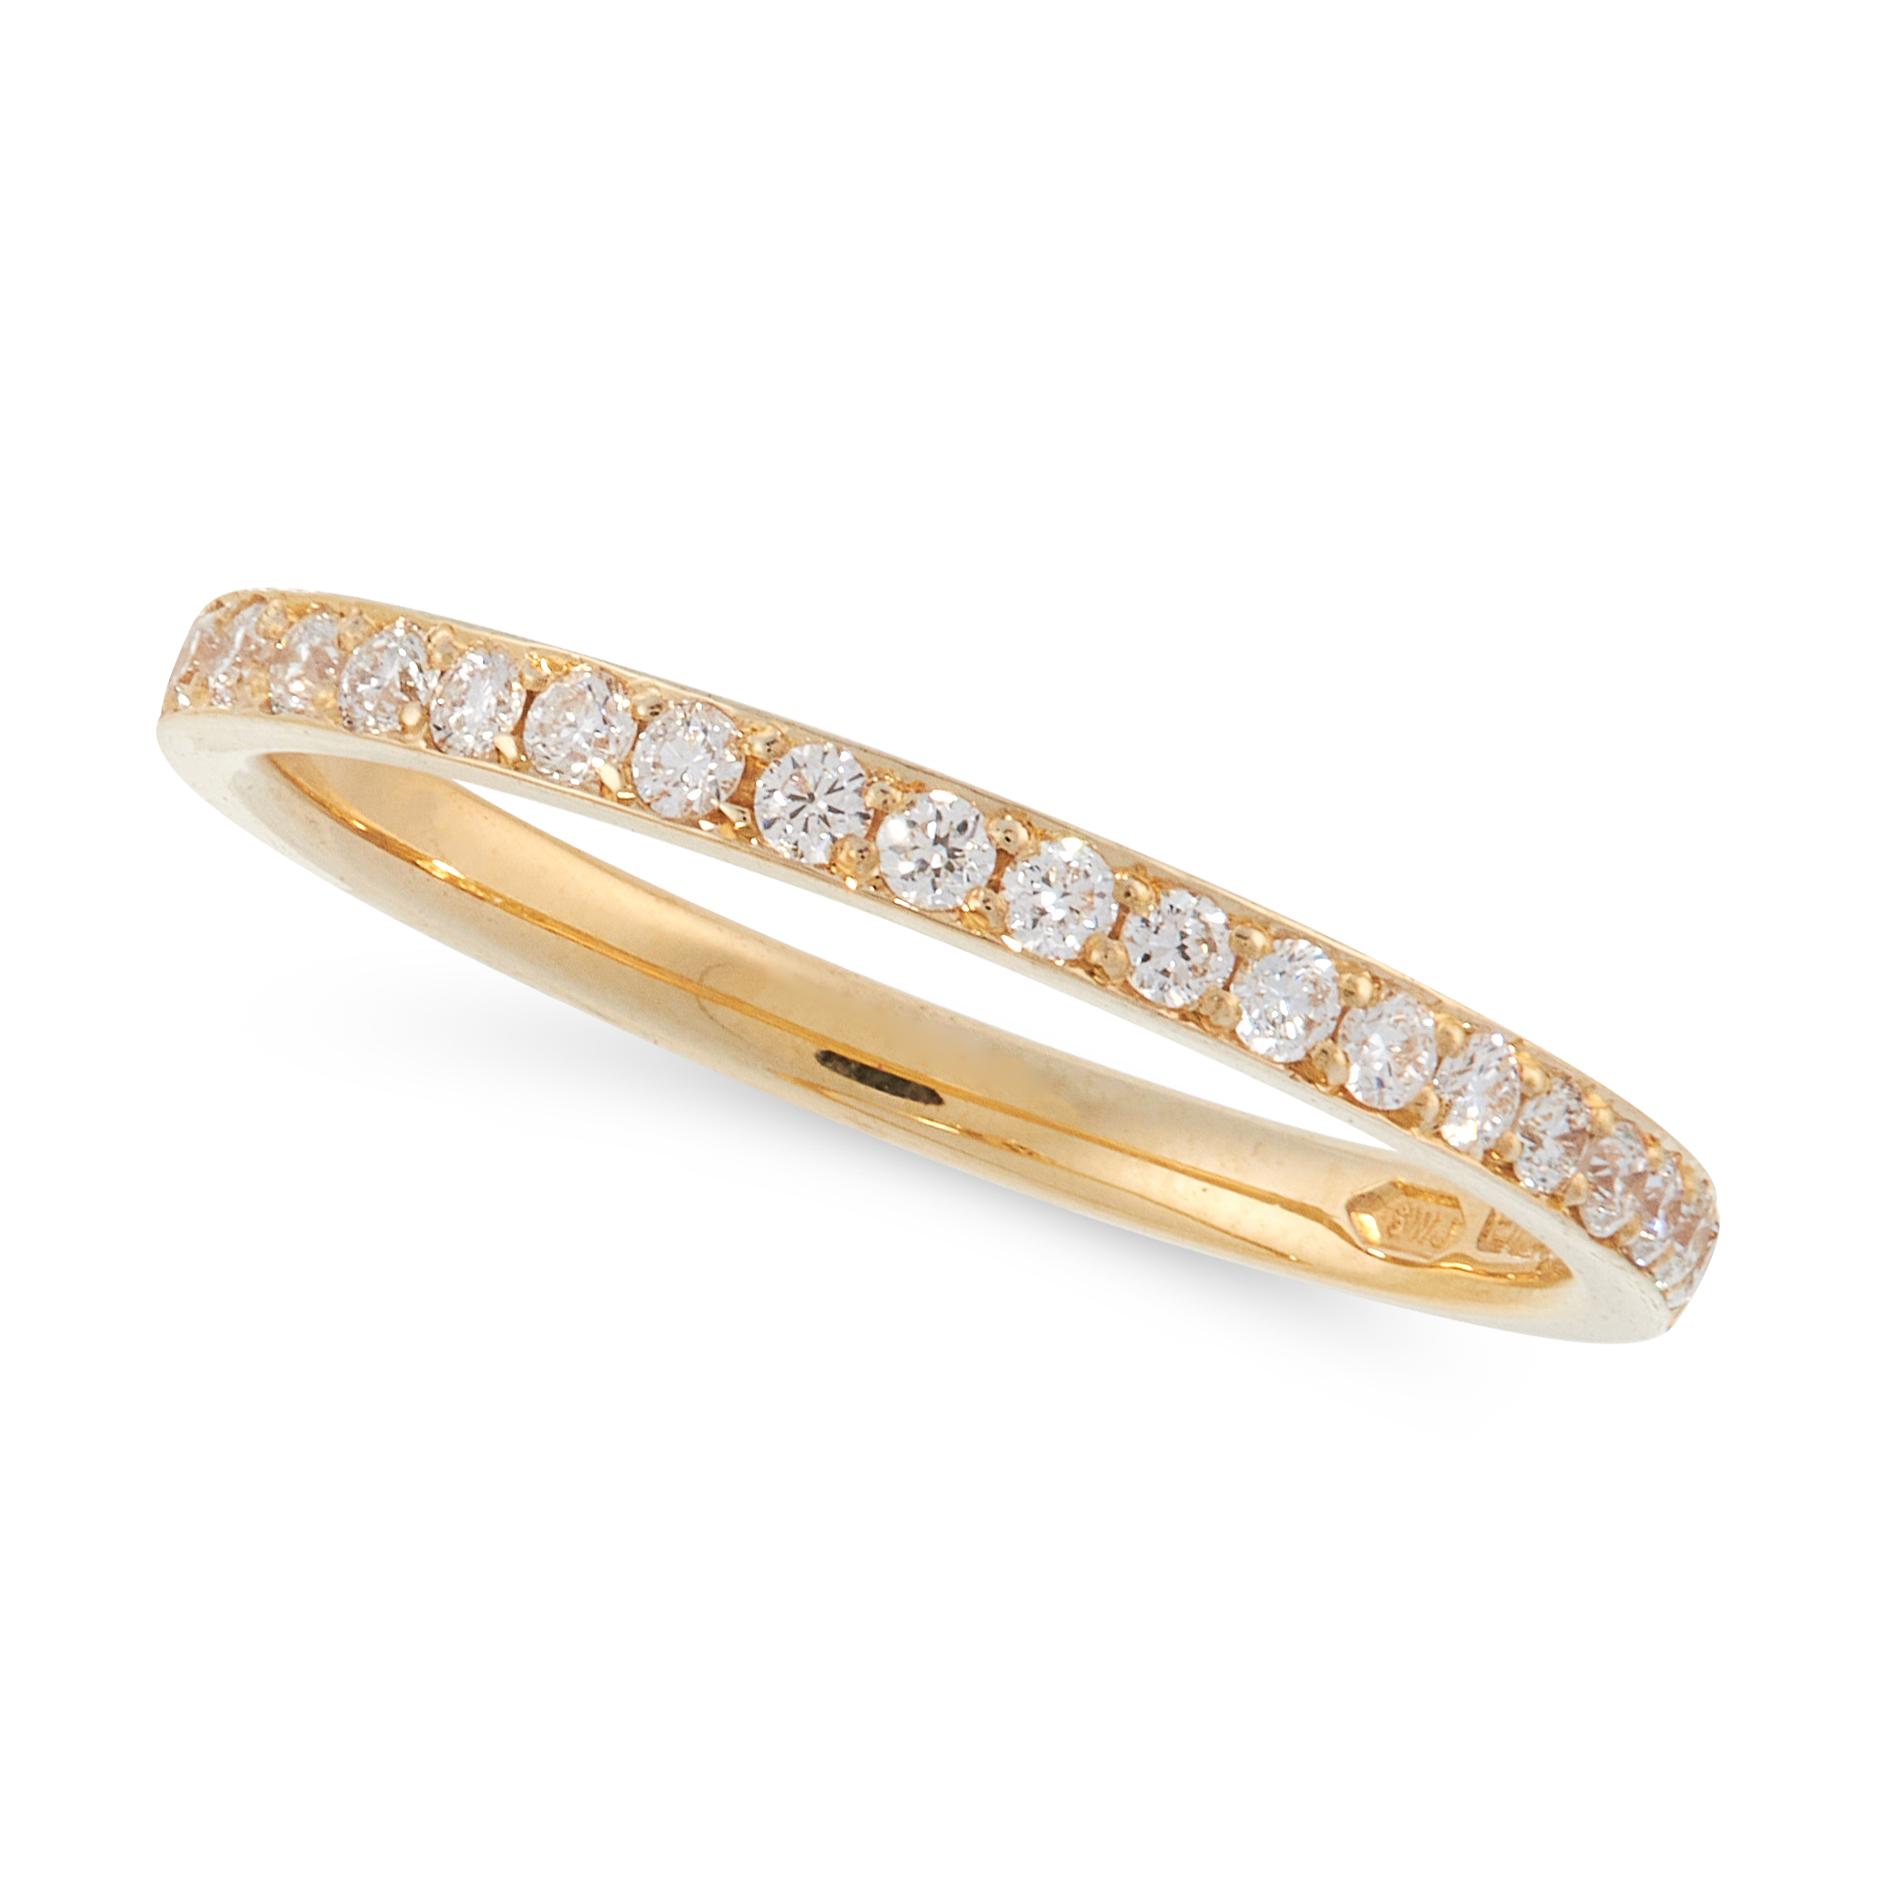 A DIAMOND HALF ETERNITY RING in 18ct yellow gold, half set with round cut diamonds, British